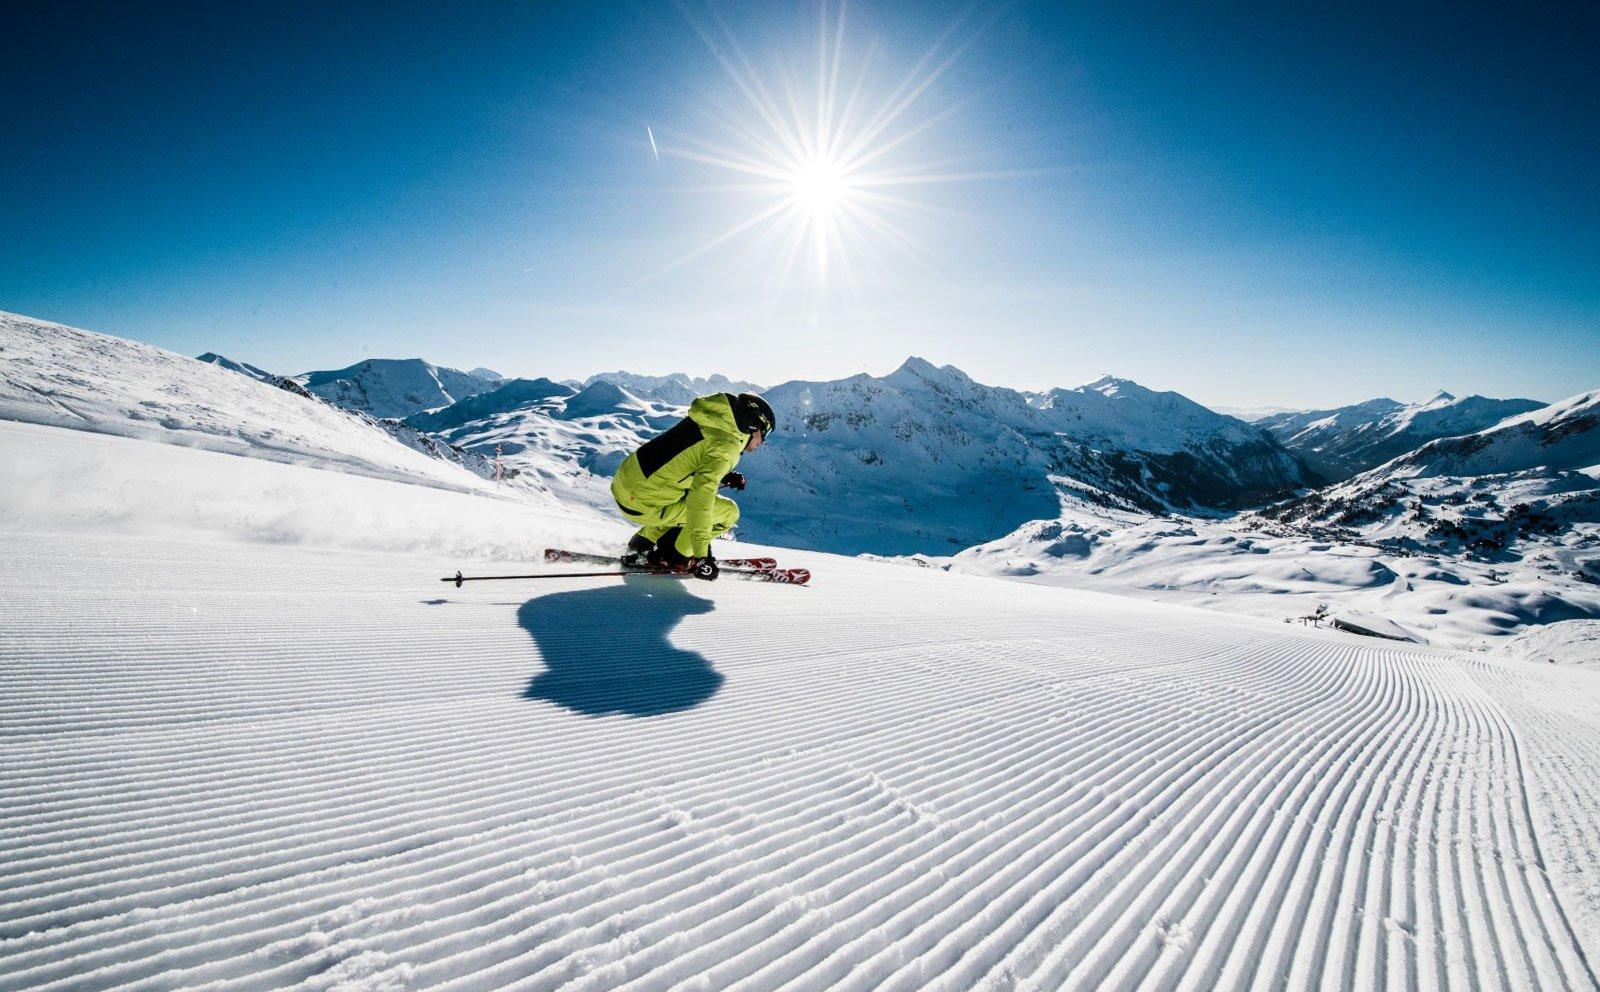 Nortlander-Obertauern-Ski-Piste-Skiloeber